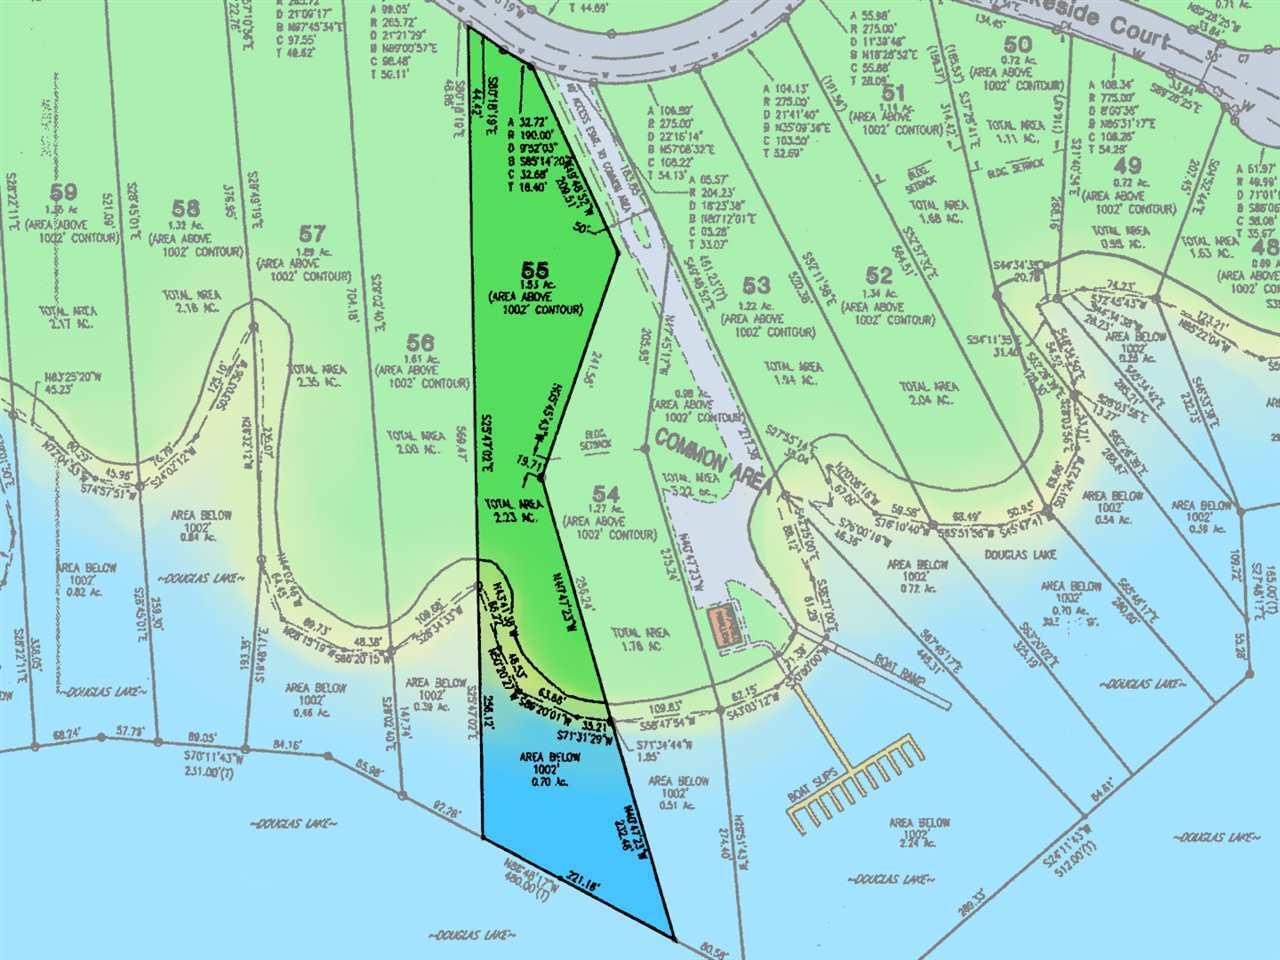 Lot 55 Sunset Harbor Drive, Dandridge, TN.| MLS# 577673 | Morristown Dandridge Tn Map on